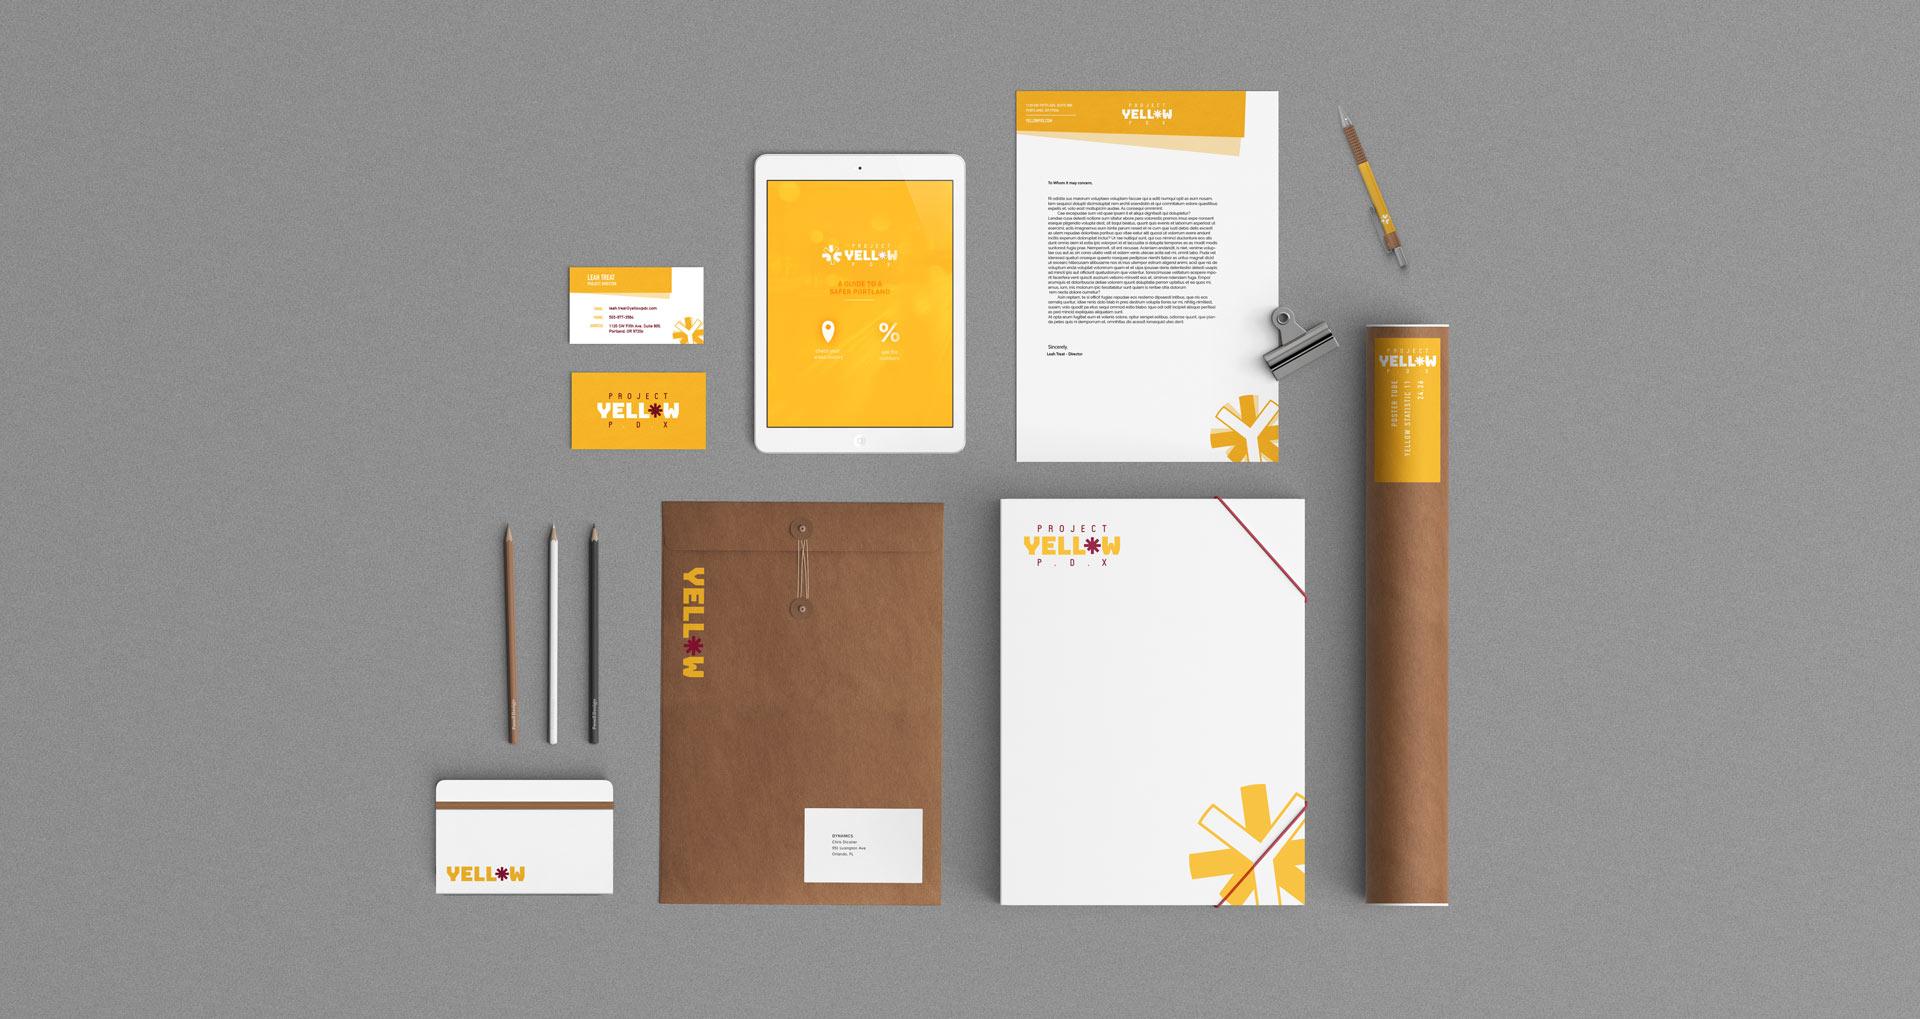 stationary letterhead business card poster-tube note-book kraft paper